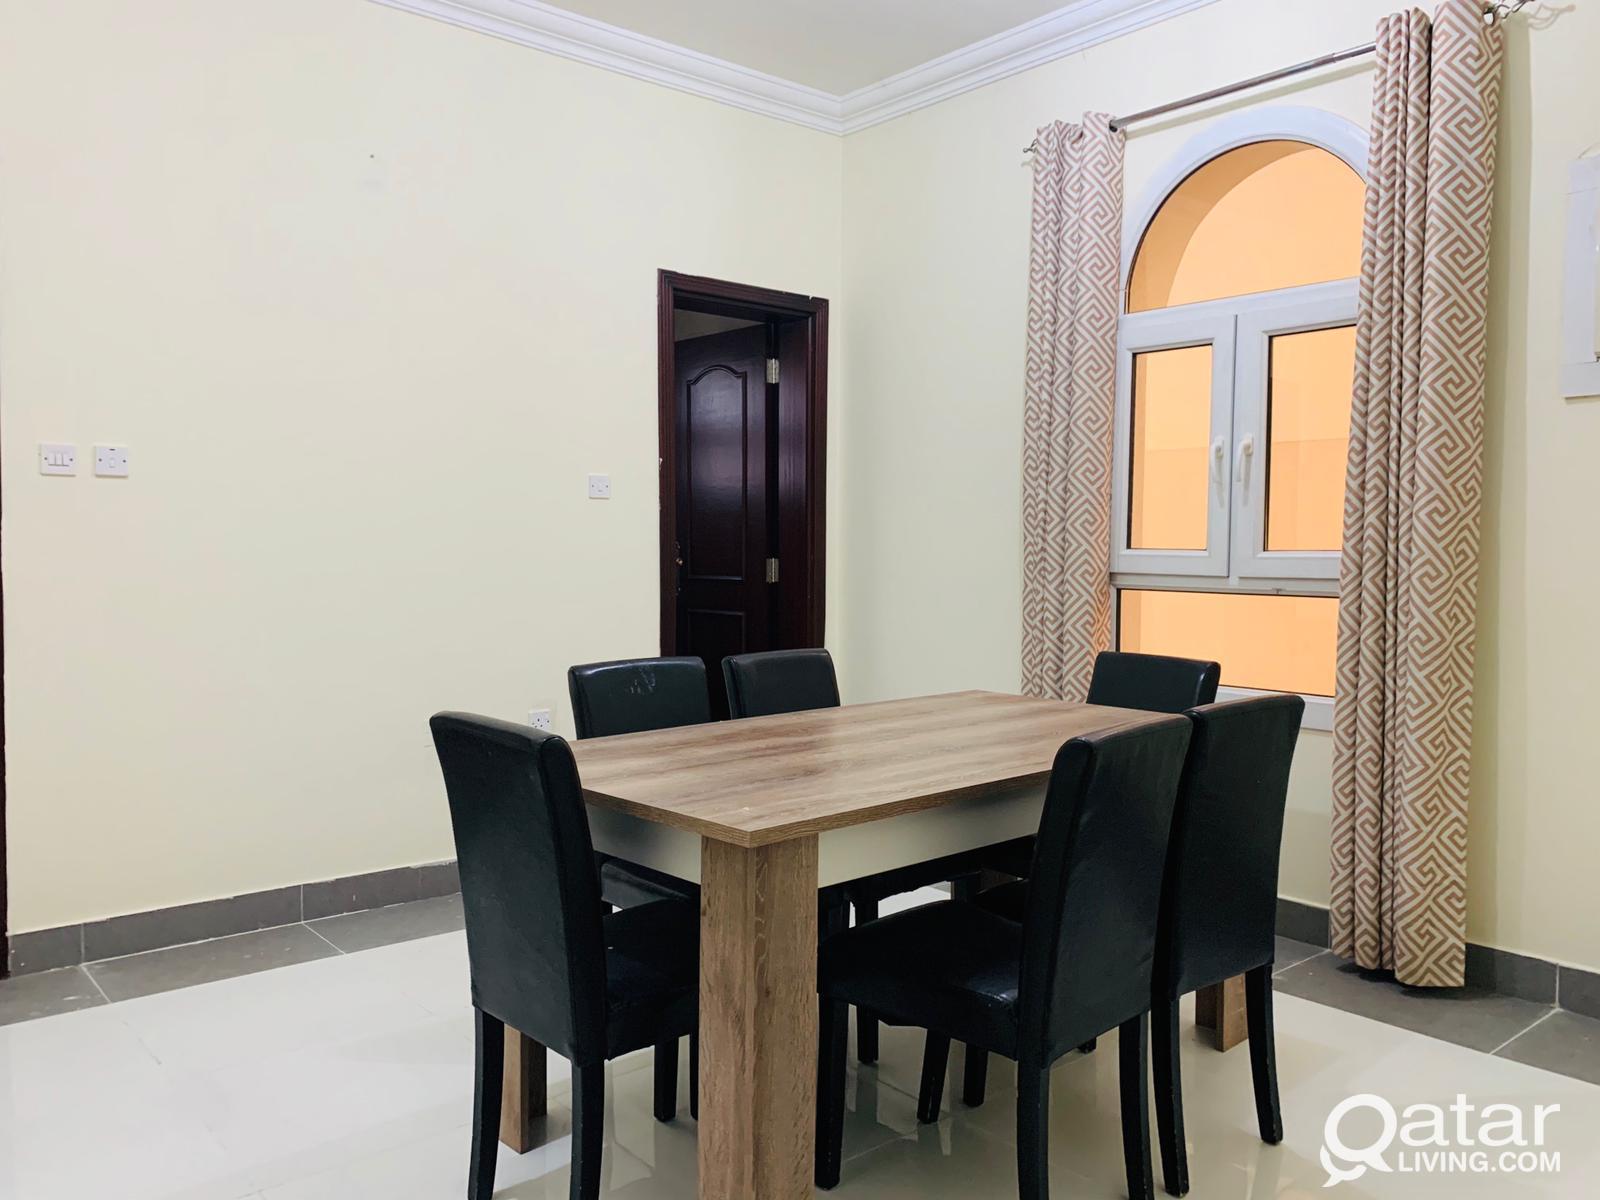 Gorgeous  3 Bedroom Compound Villa At Al thumama.